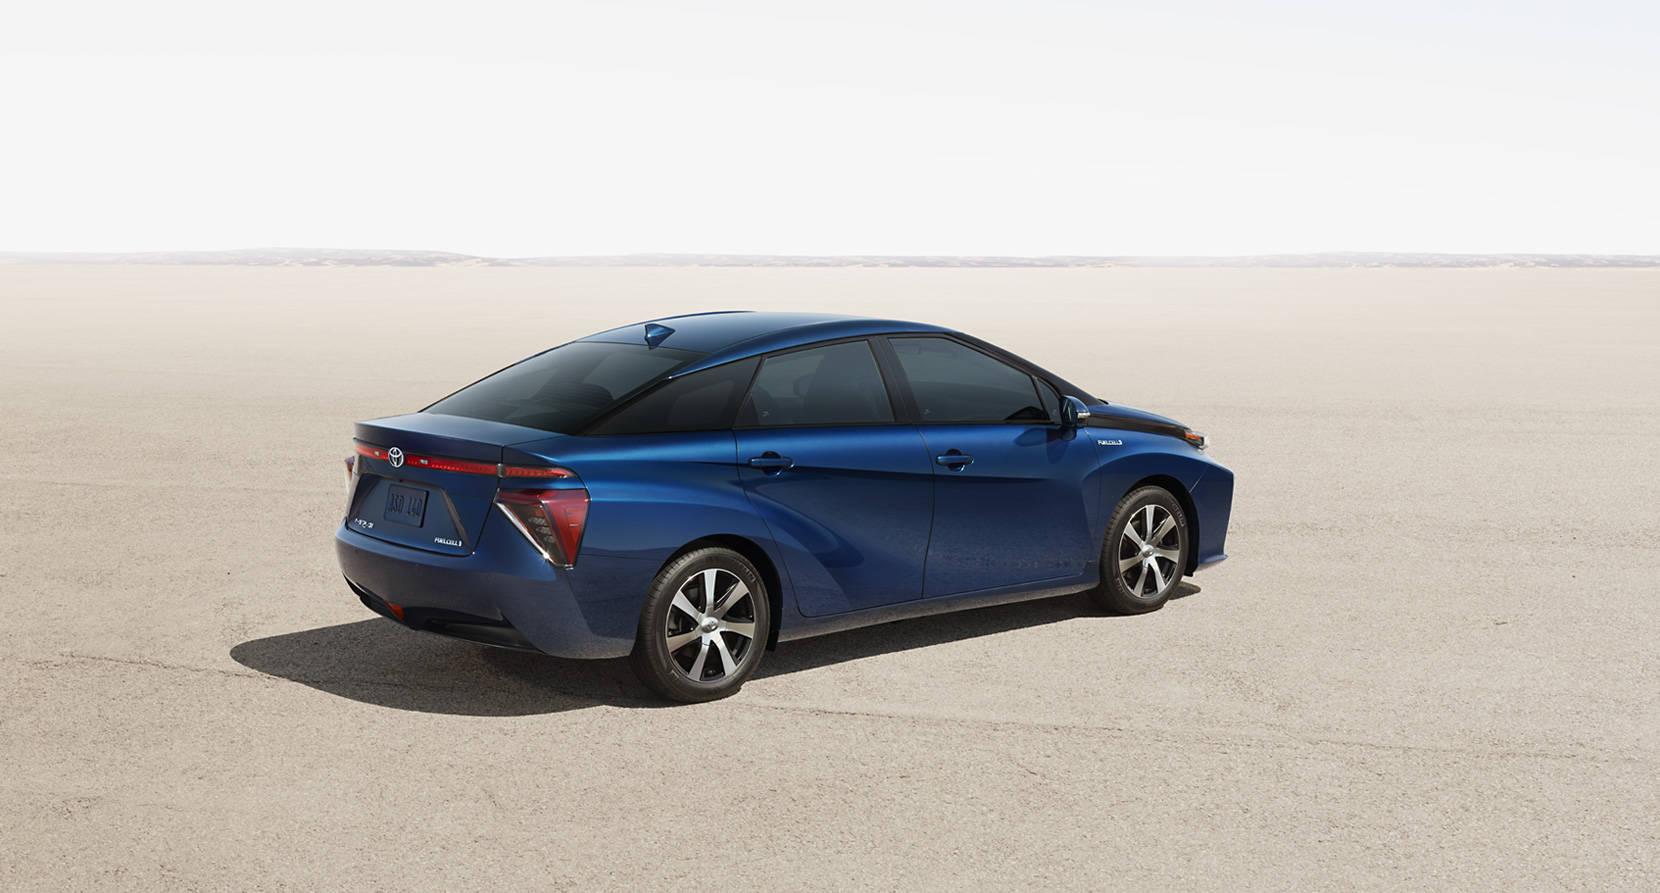 2017 Toyota Mirai Exterior